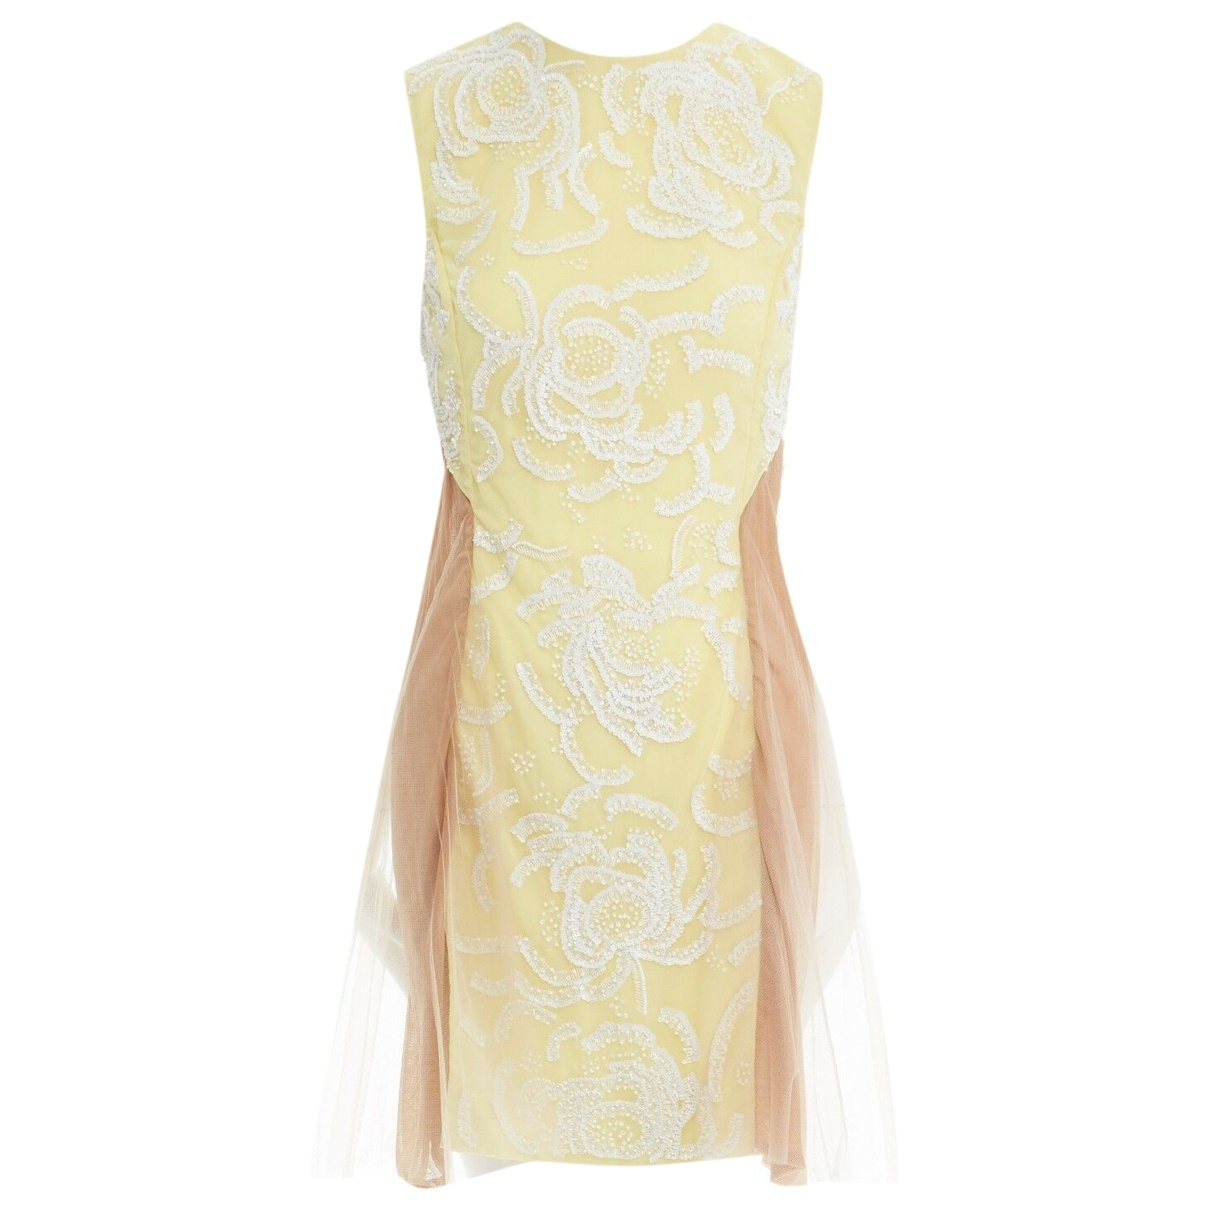 Christopher Kane \N Yellow Cotton dress for Women 6 UK